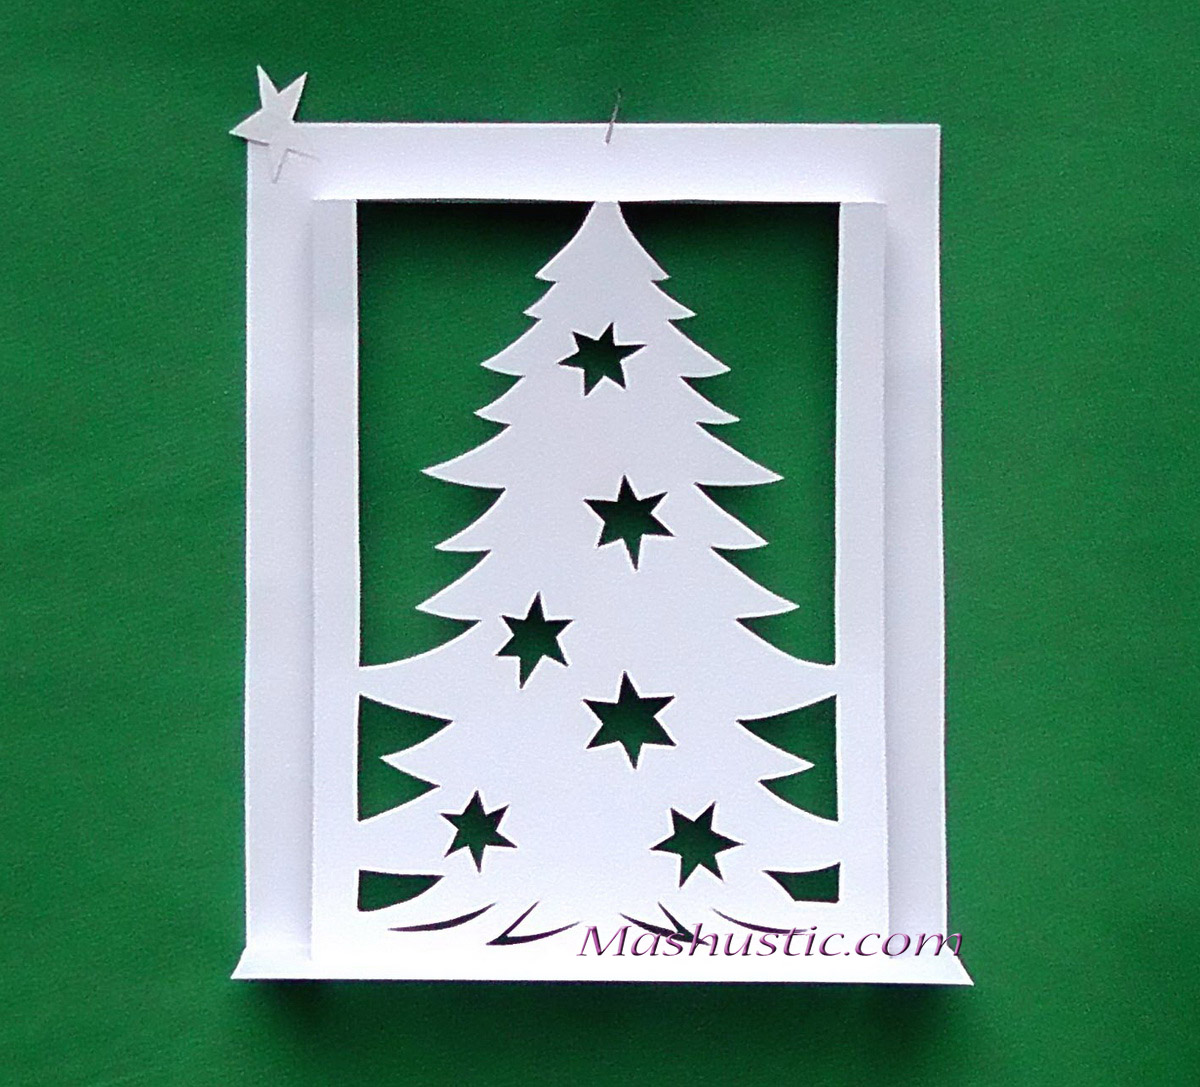 Christmas tree pop up card making | Mashustic.com